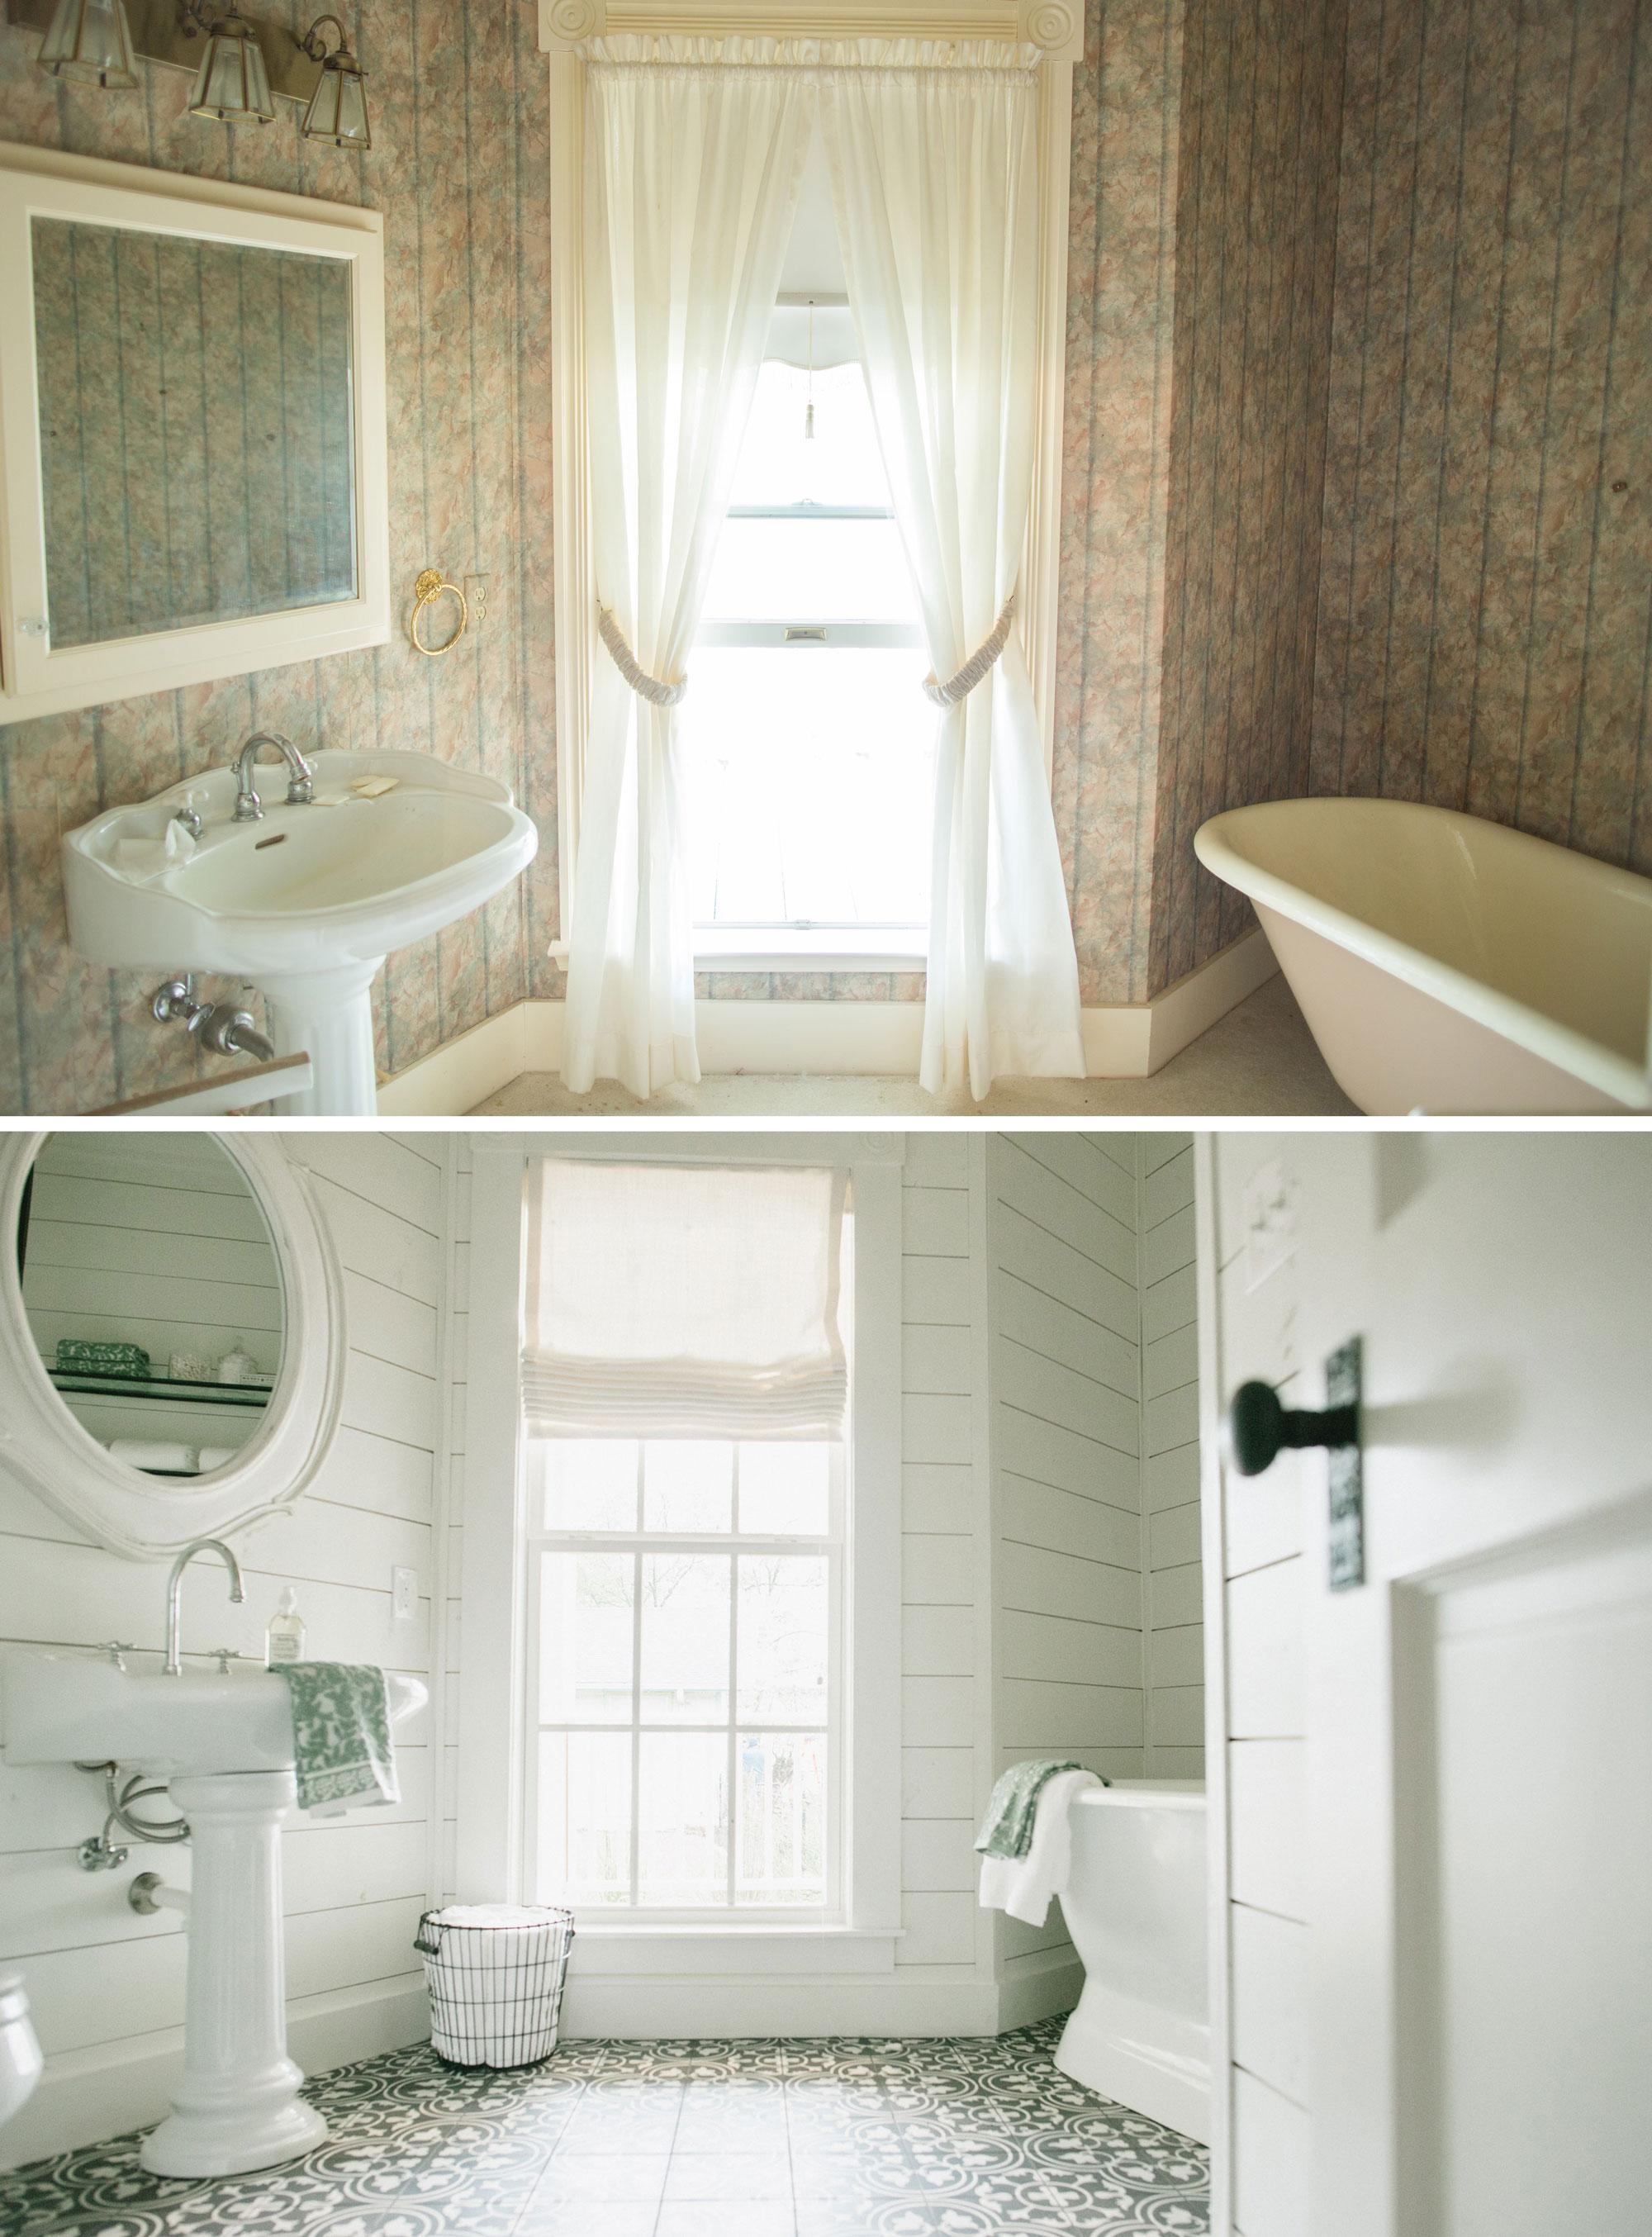 Different Bathroom Designs Small Bathrooms